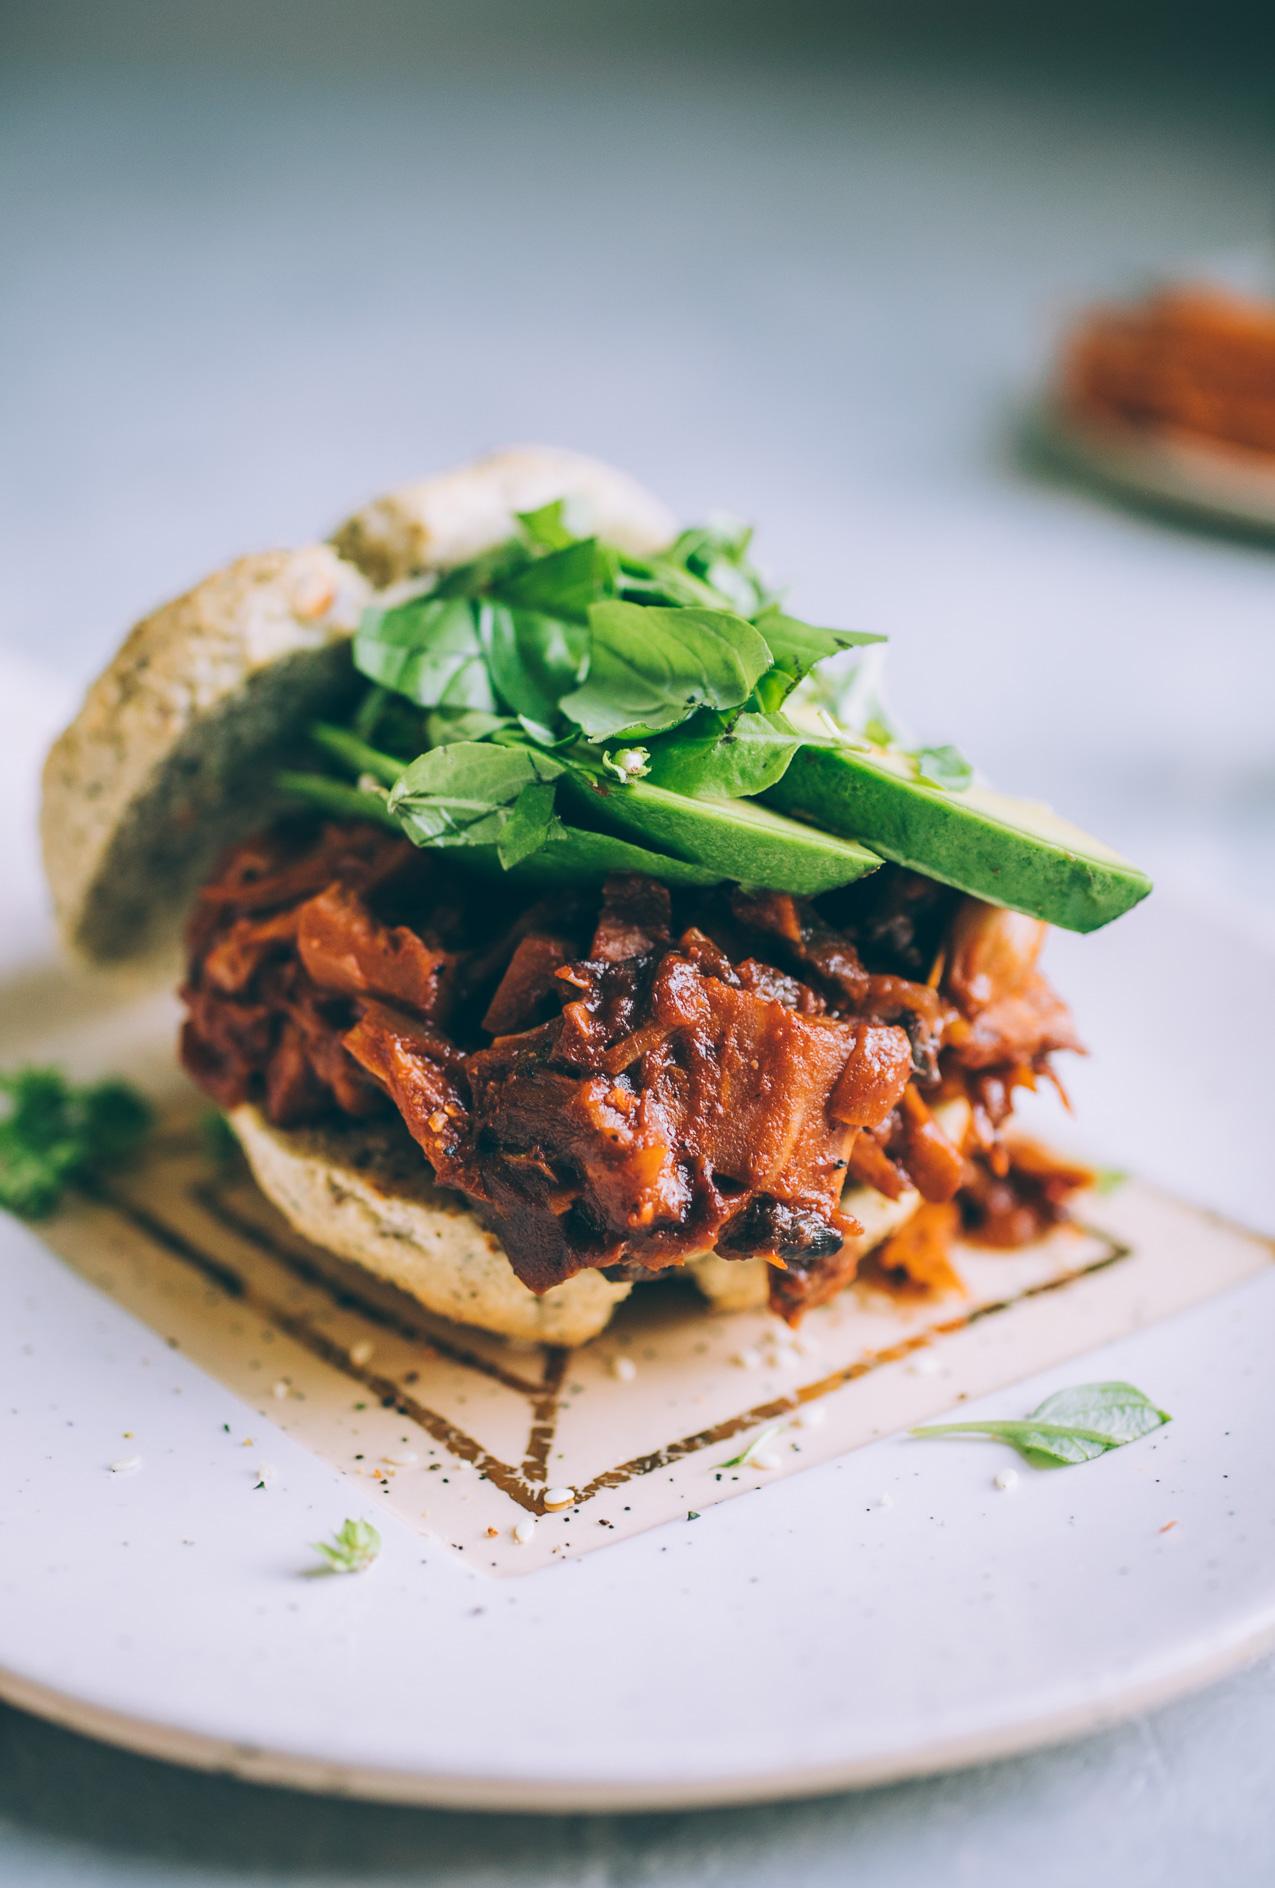 jackfruit mushroom barbecue recipe | vegan barbecue chicken recipe